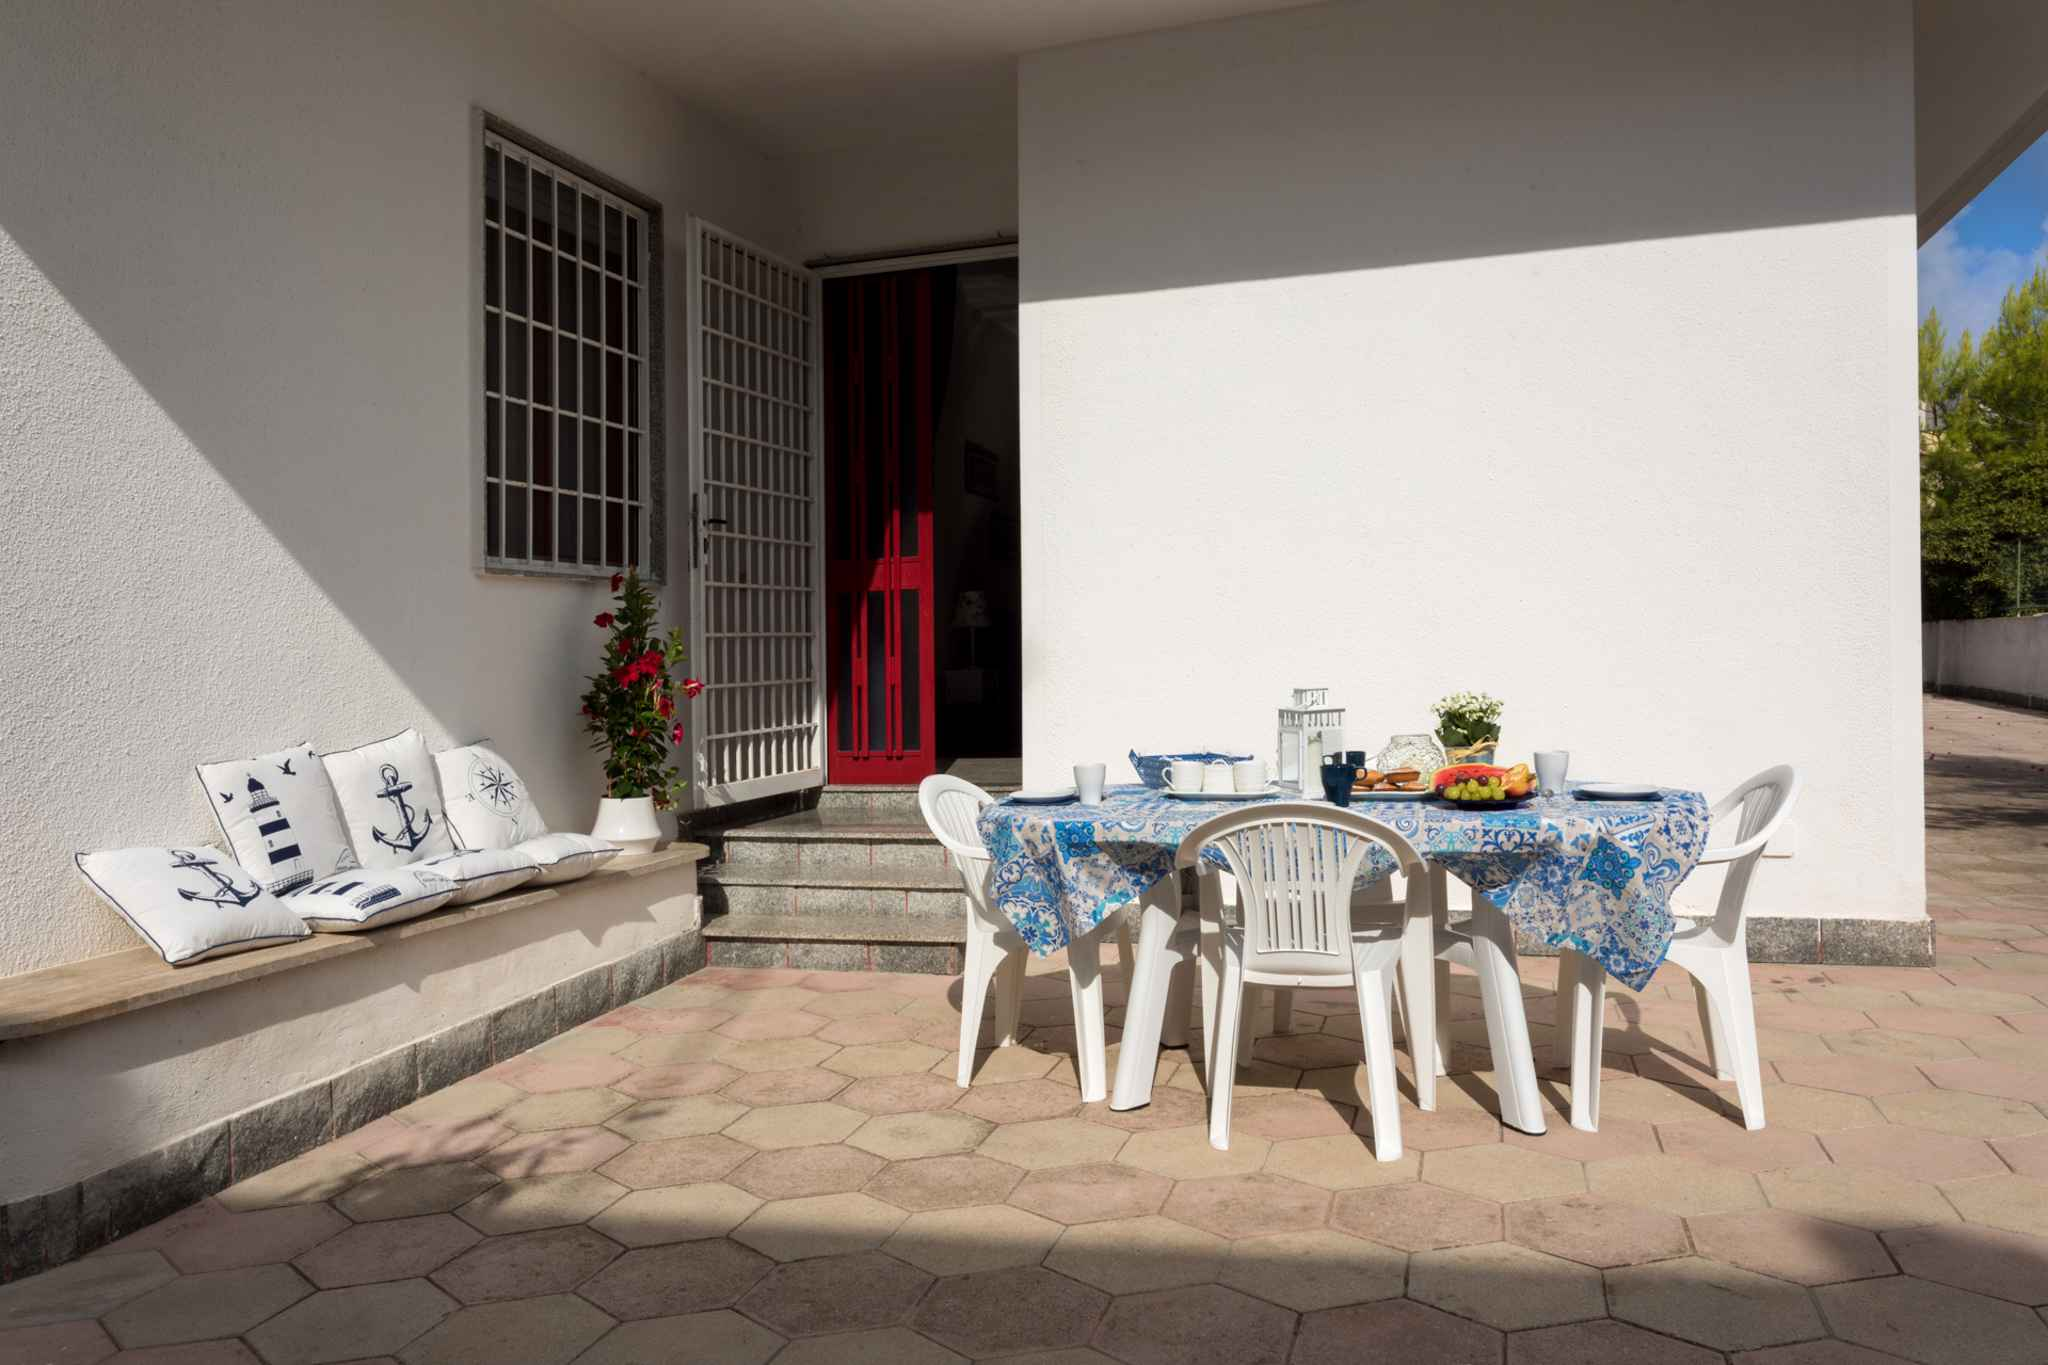 Ferienhaus Vicino Al Mare (560014), Alliste, Lecce, Apulien, Italien, Bild 4